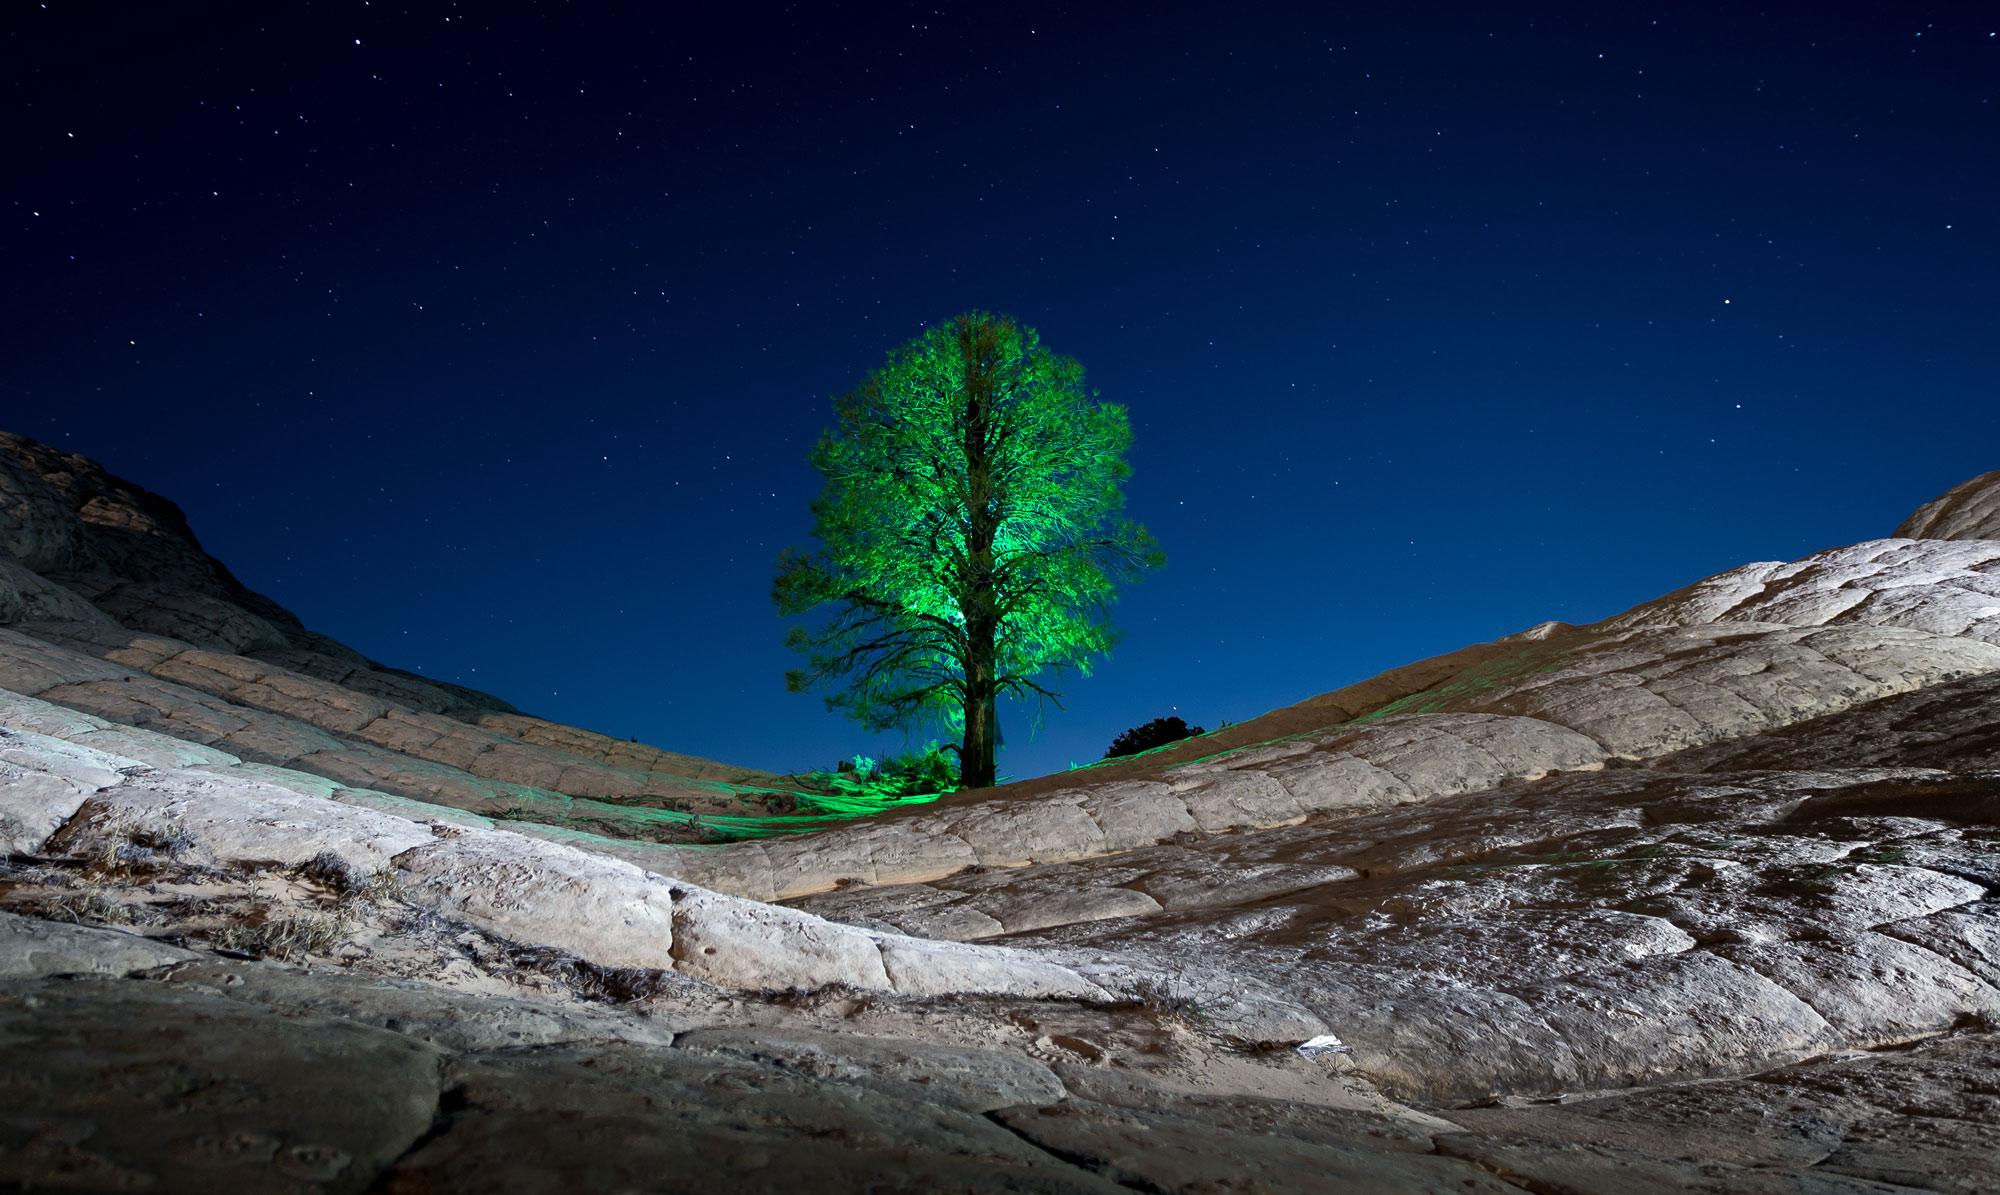 LightPainting-Gunnar-Heilmann_USA-Arizona-White-Pocket-tree-stars-green-extra-arm-visual.jpg